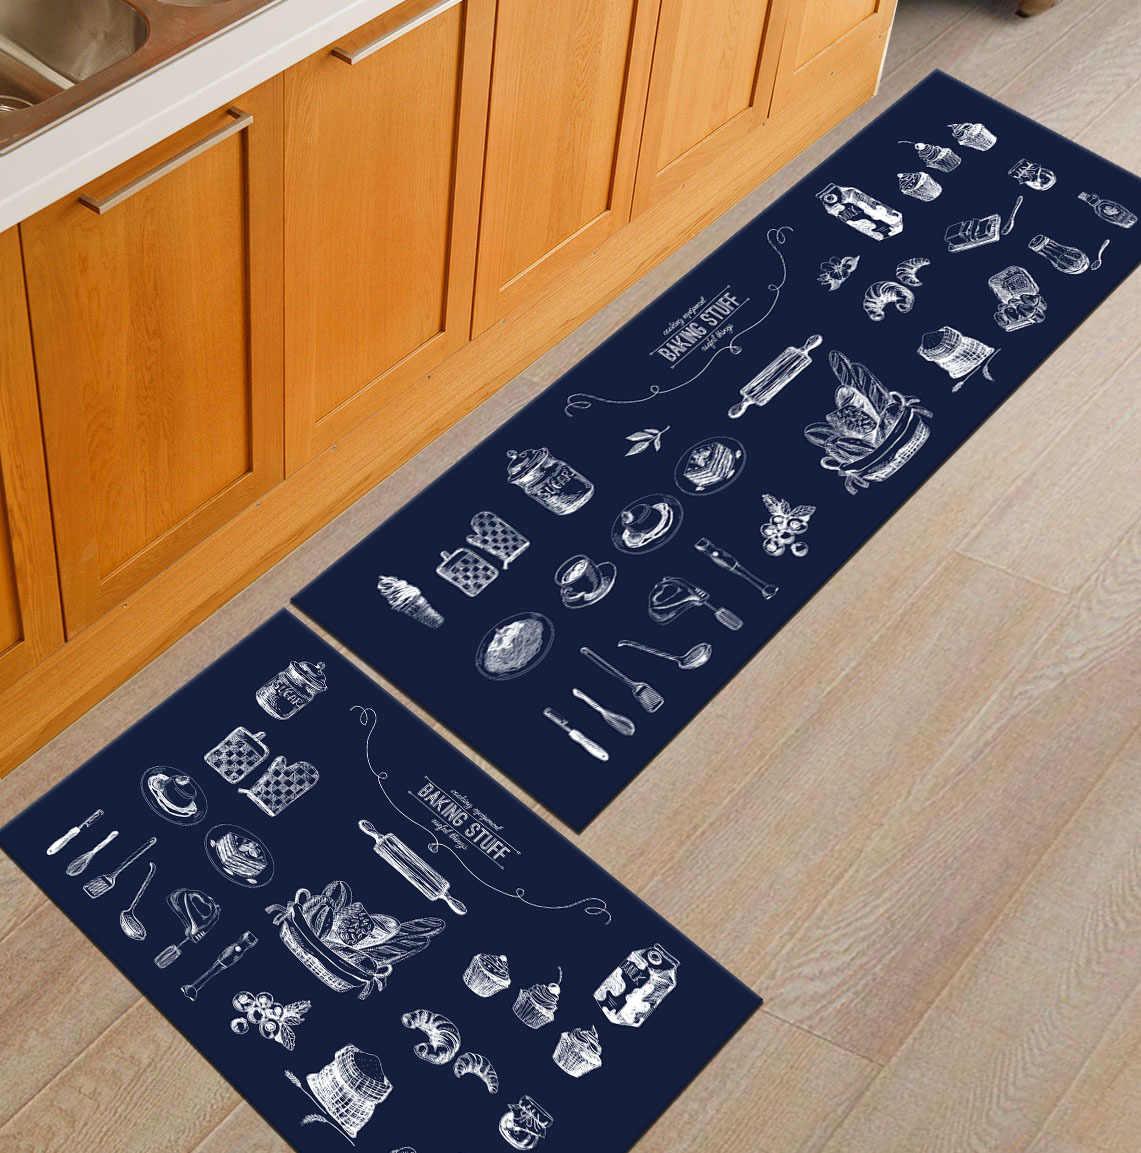 Zeegle Коврики для кухни ванная комната коврики противоскользящие кухонная утварь коврики с принтом коврики для прихожей ковры для спальни